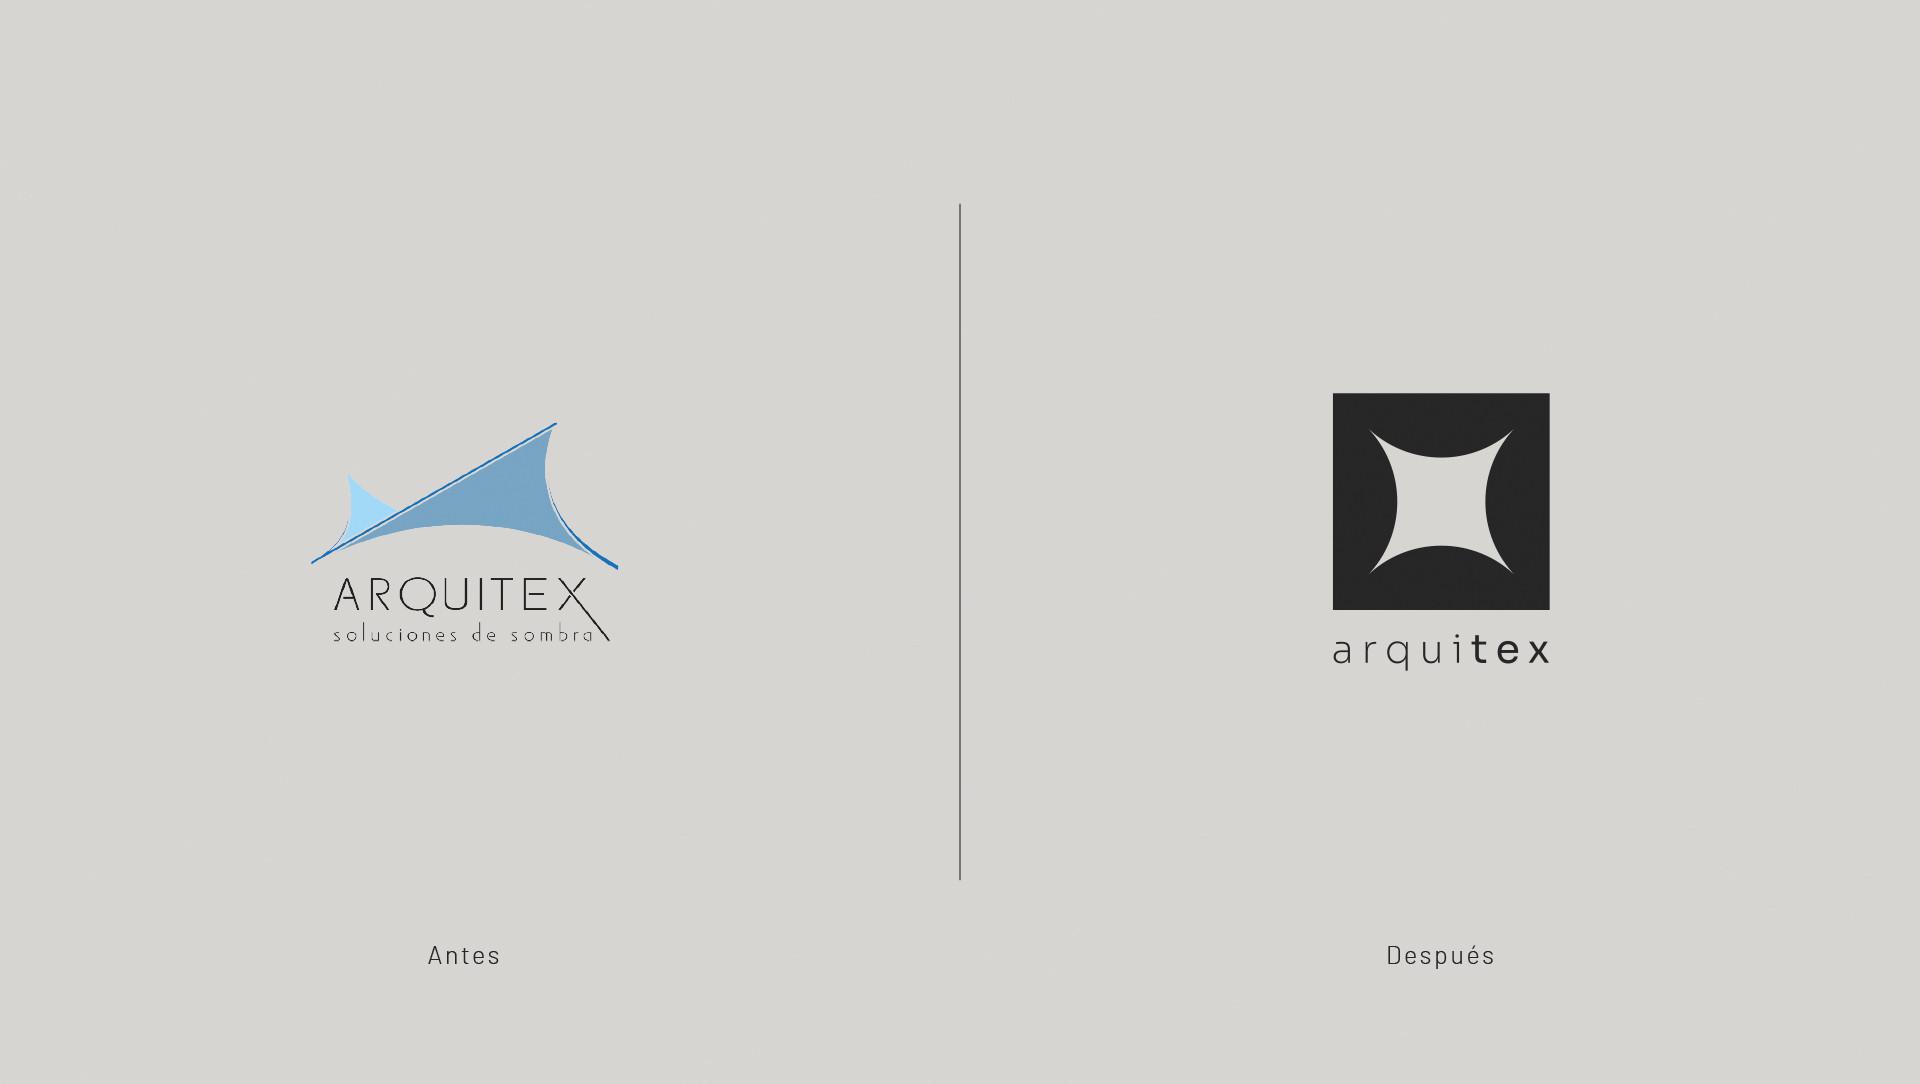 ARQUITEX_03.jpg